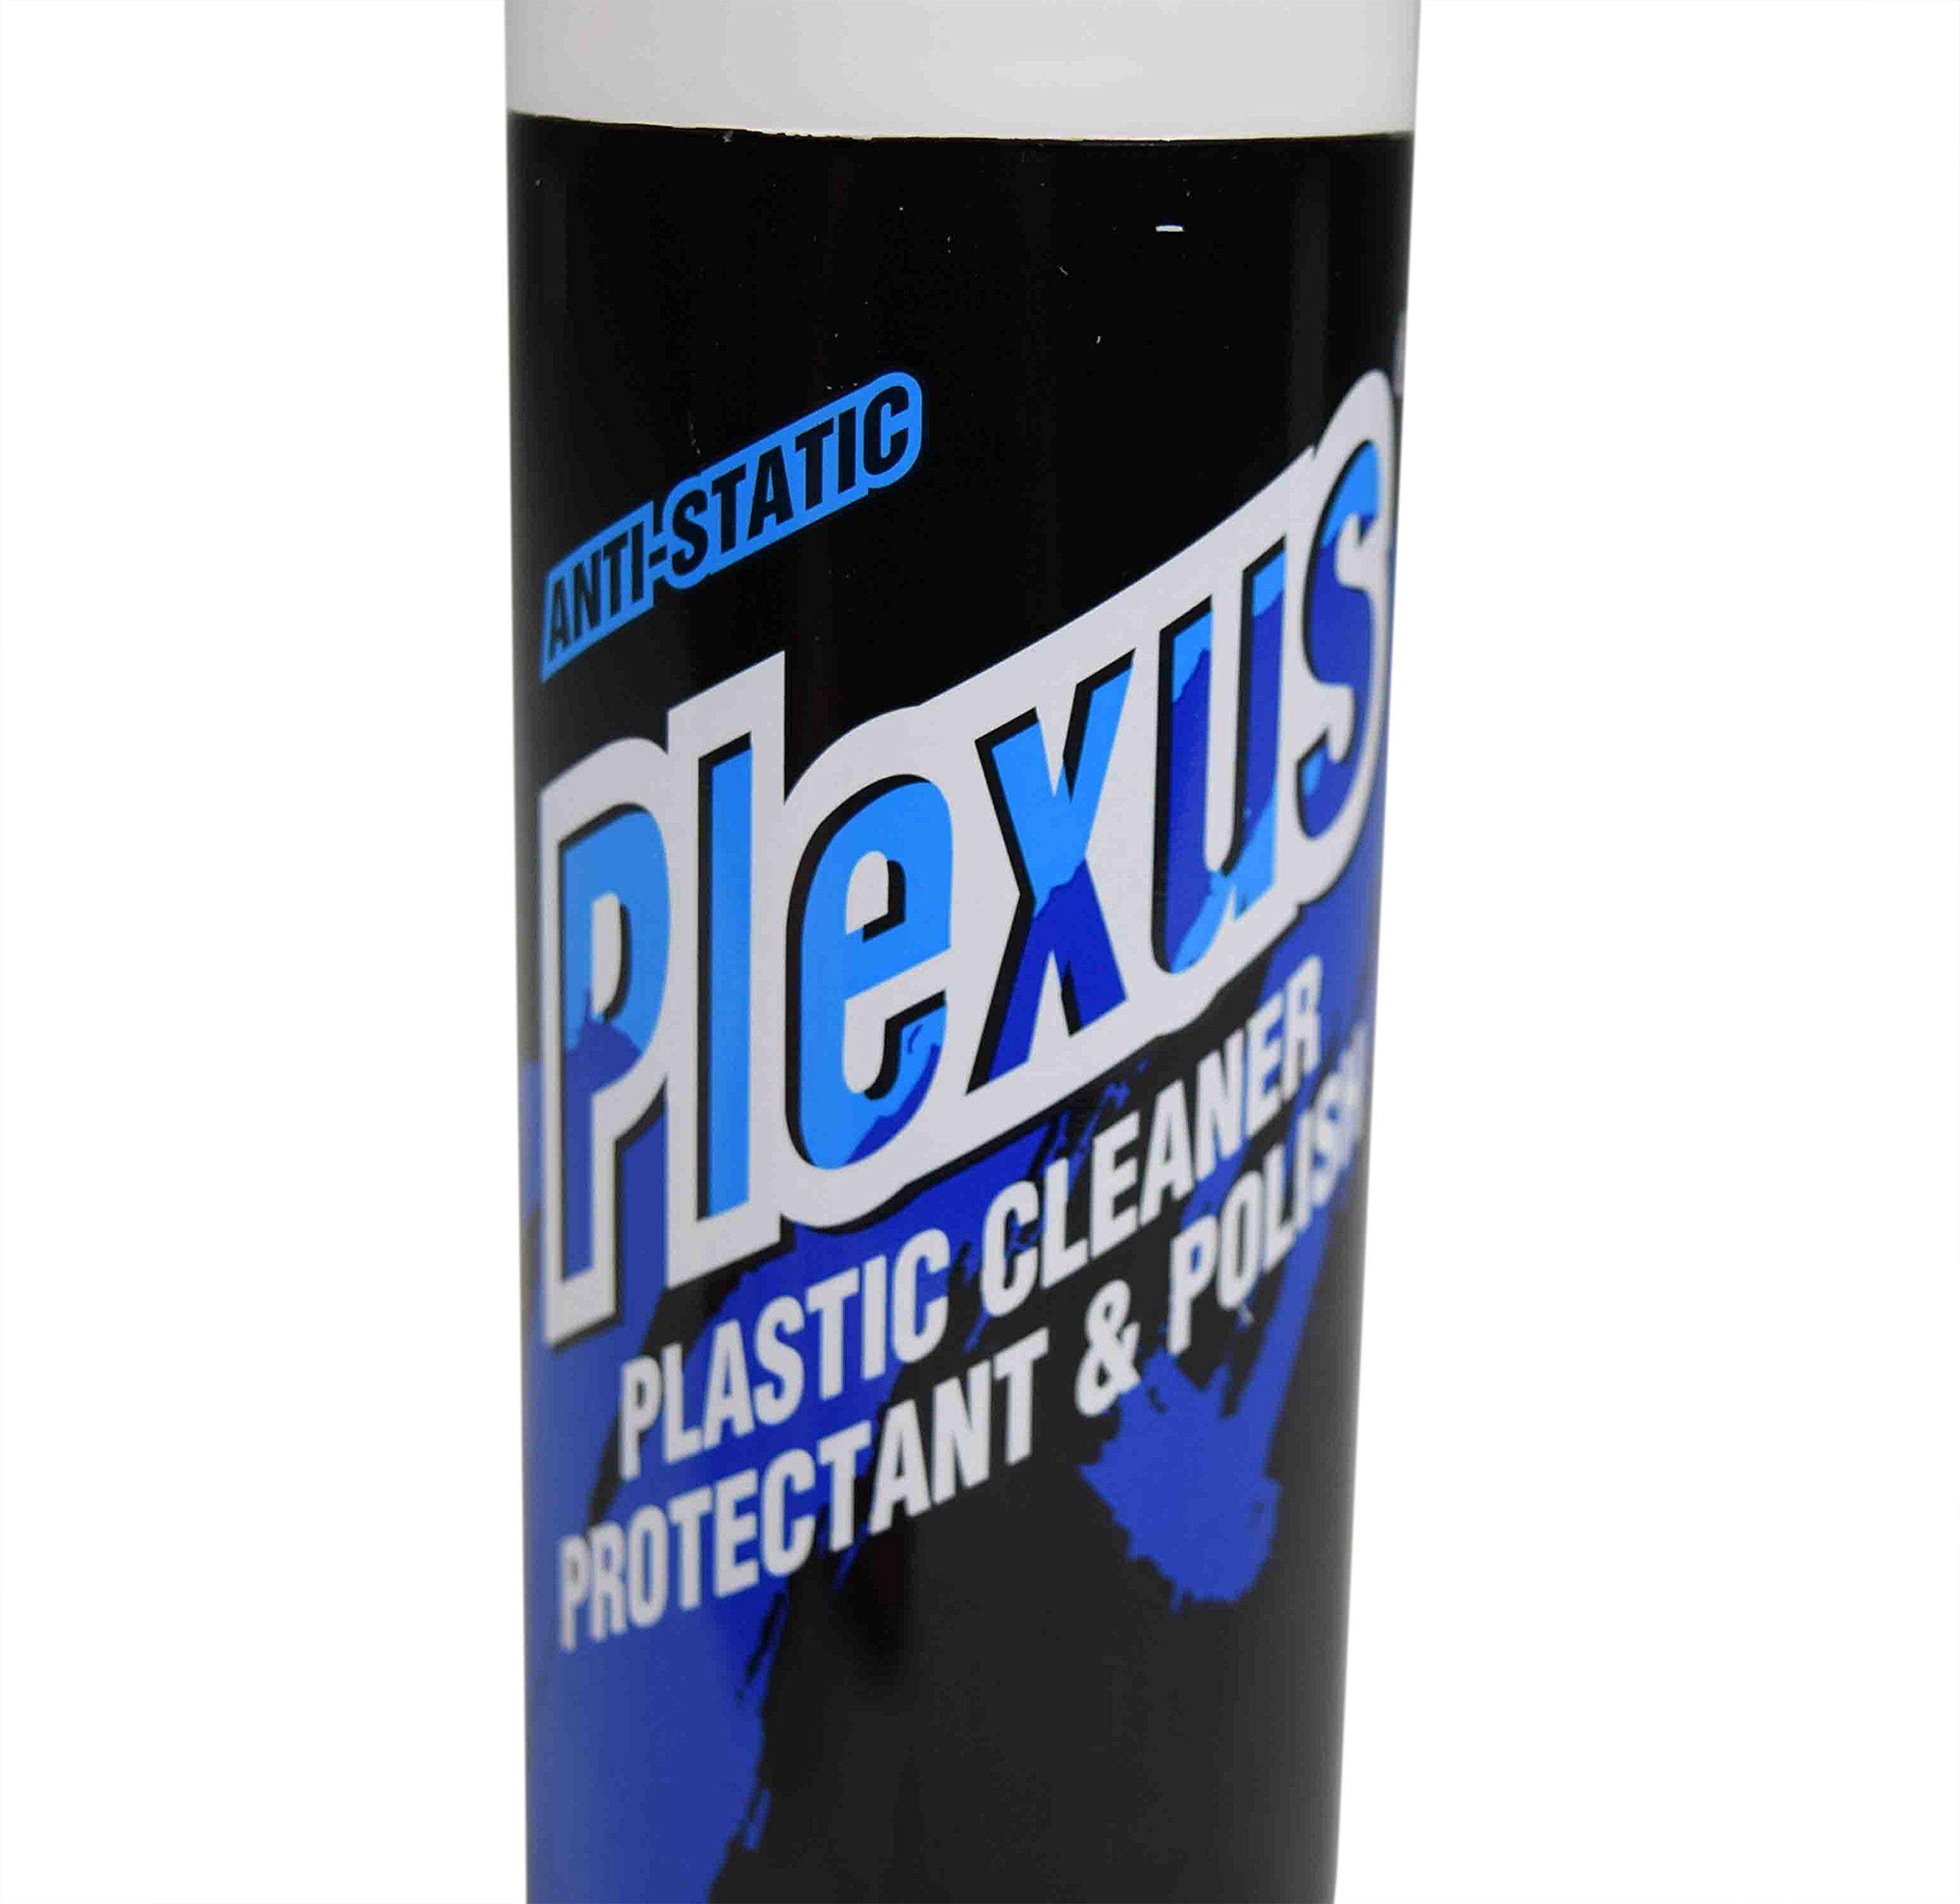 Plexus Motocycle Plastic Cleaner and Protectant 20207 7oz Aerosol (2) by Plexus (Image #3)